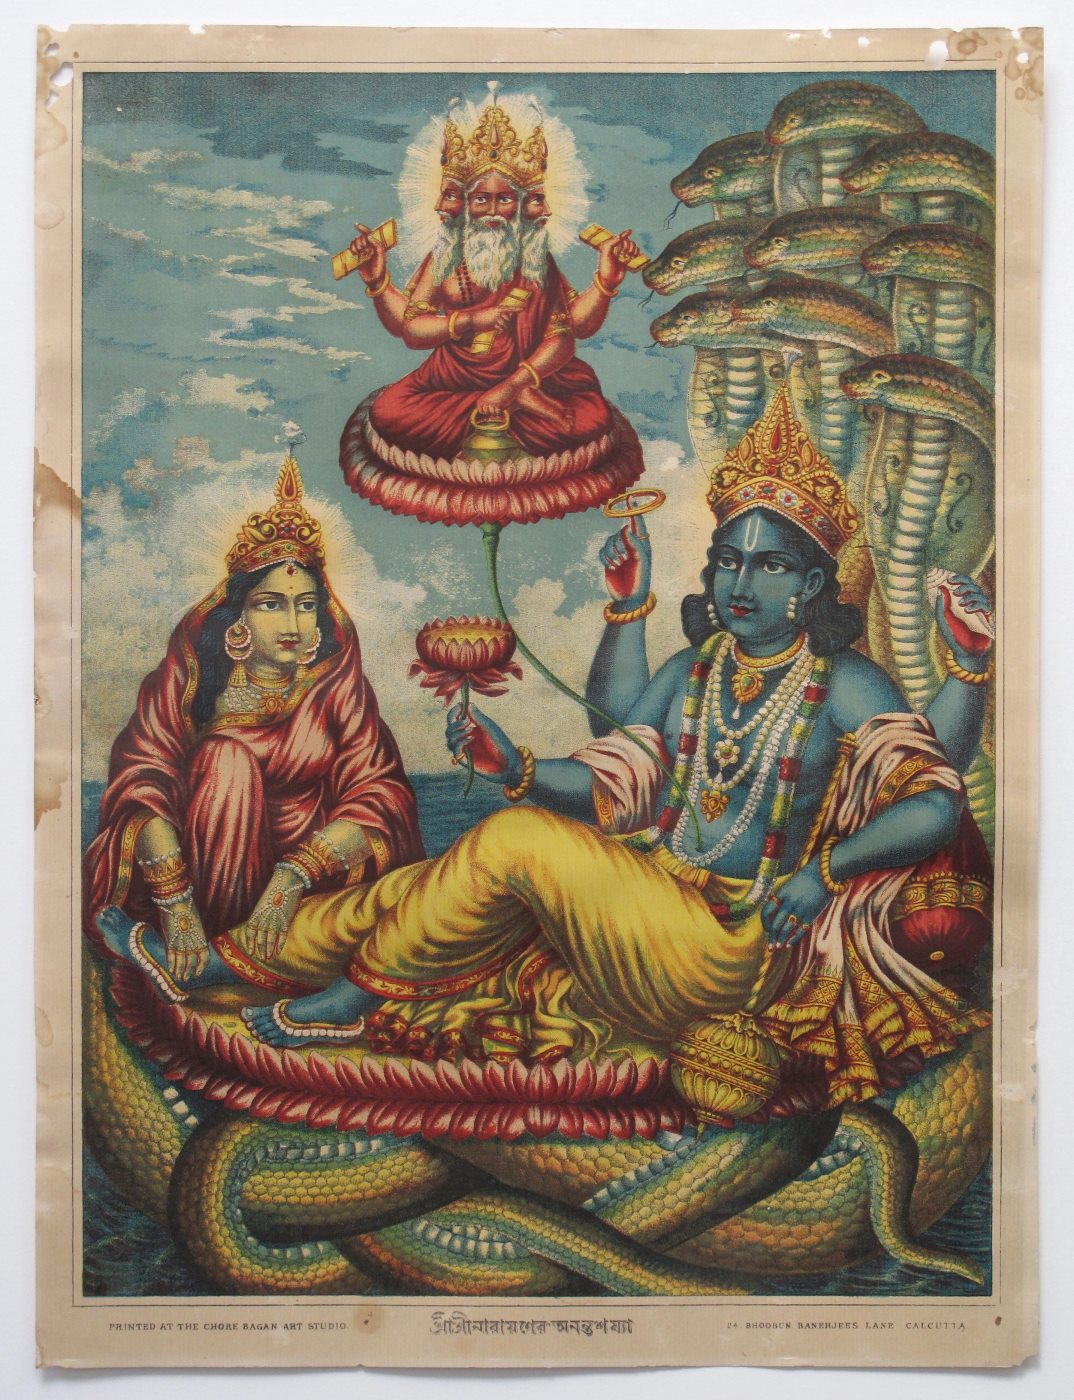 Anantashayi Vishnu - Chore Bagan Art Studio, Colour Lithograph, Calcutta (Kolkata), c1890